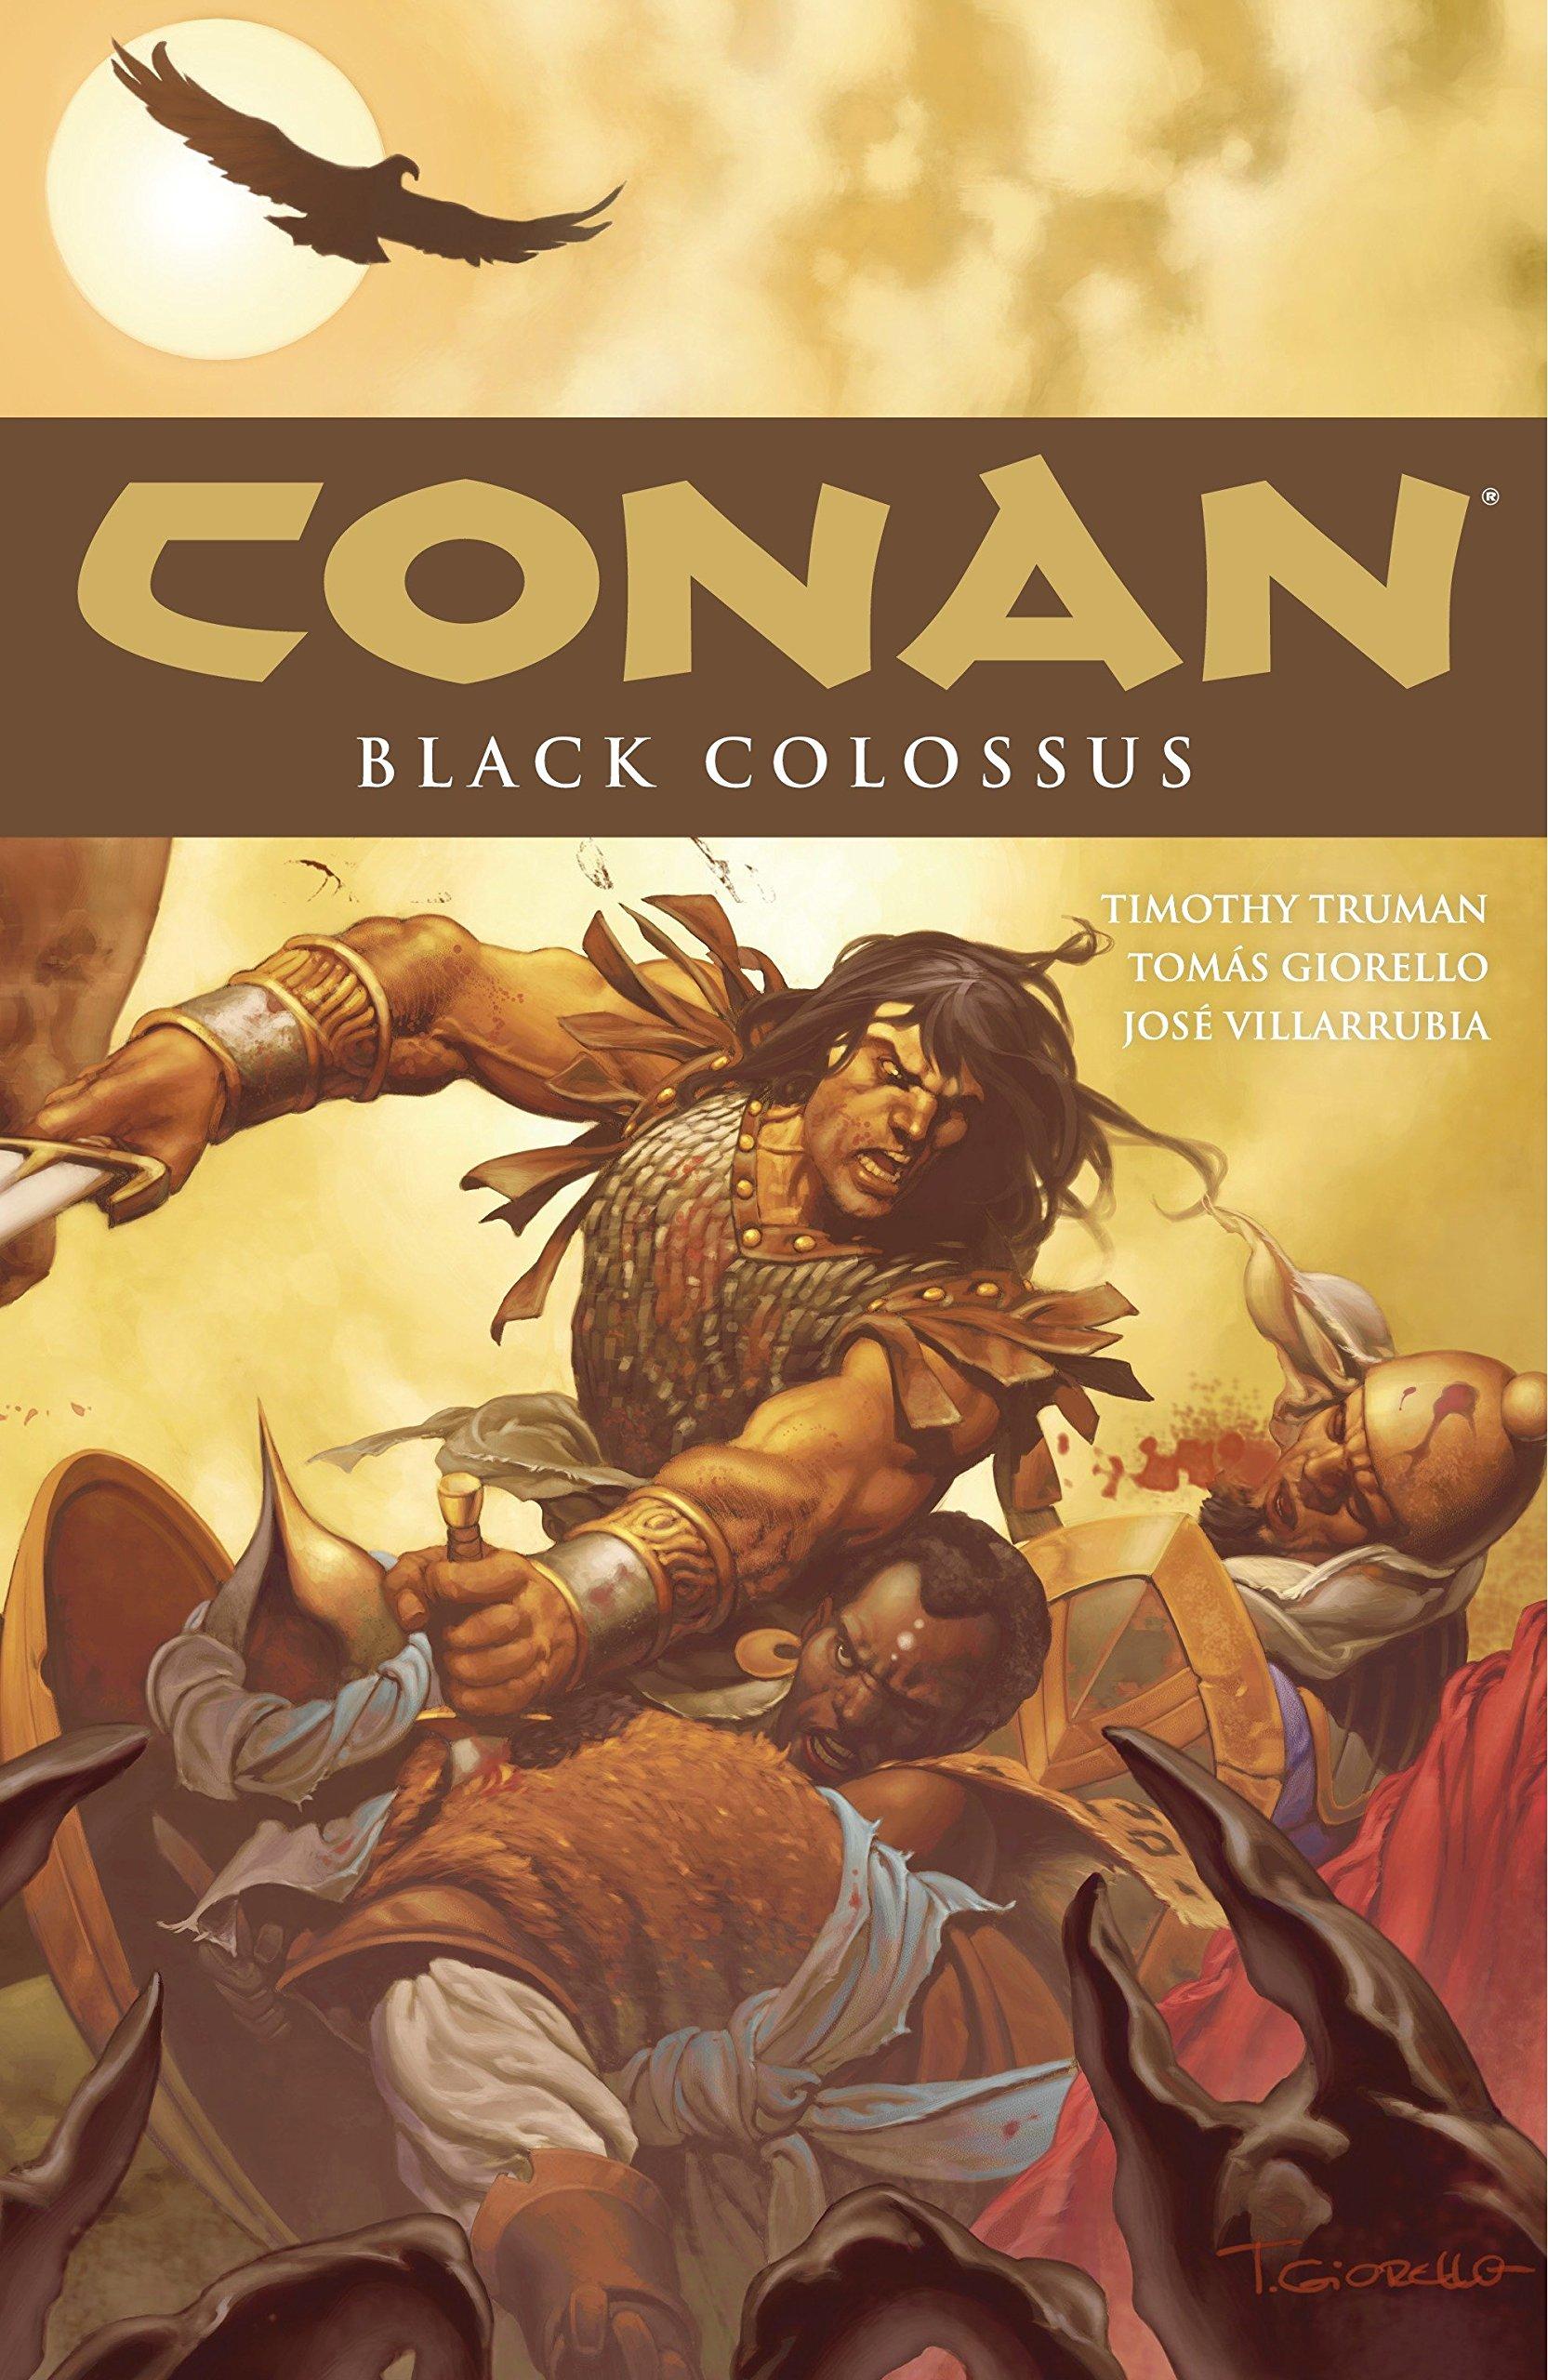 Conan Volume 8: Black Colossus ebook